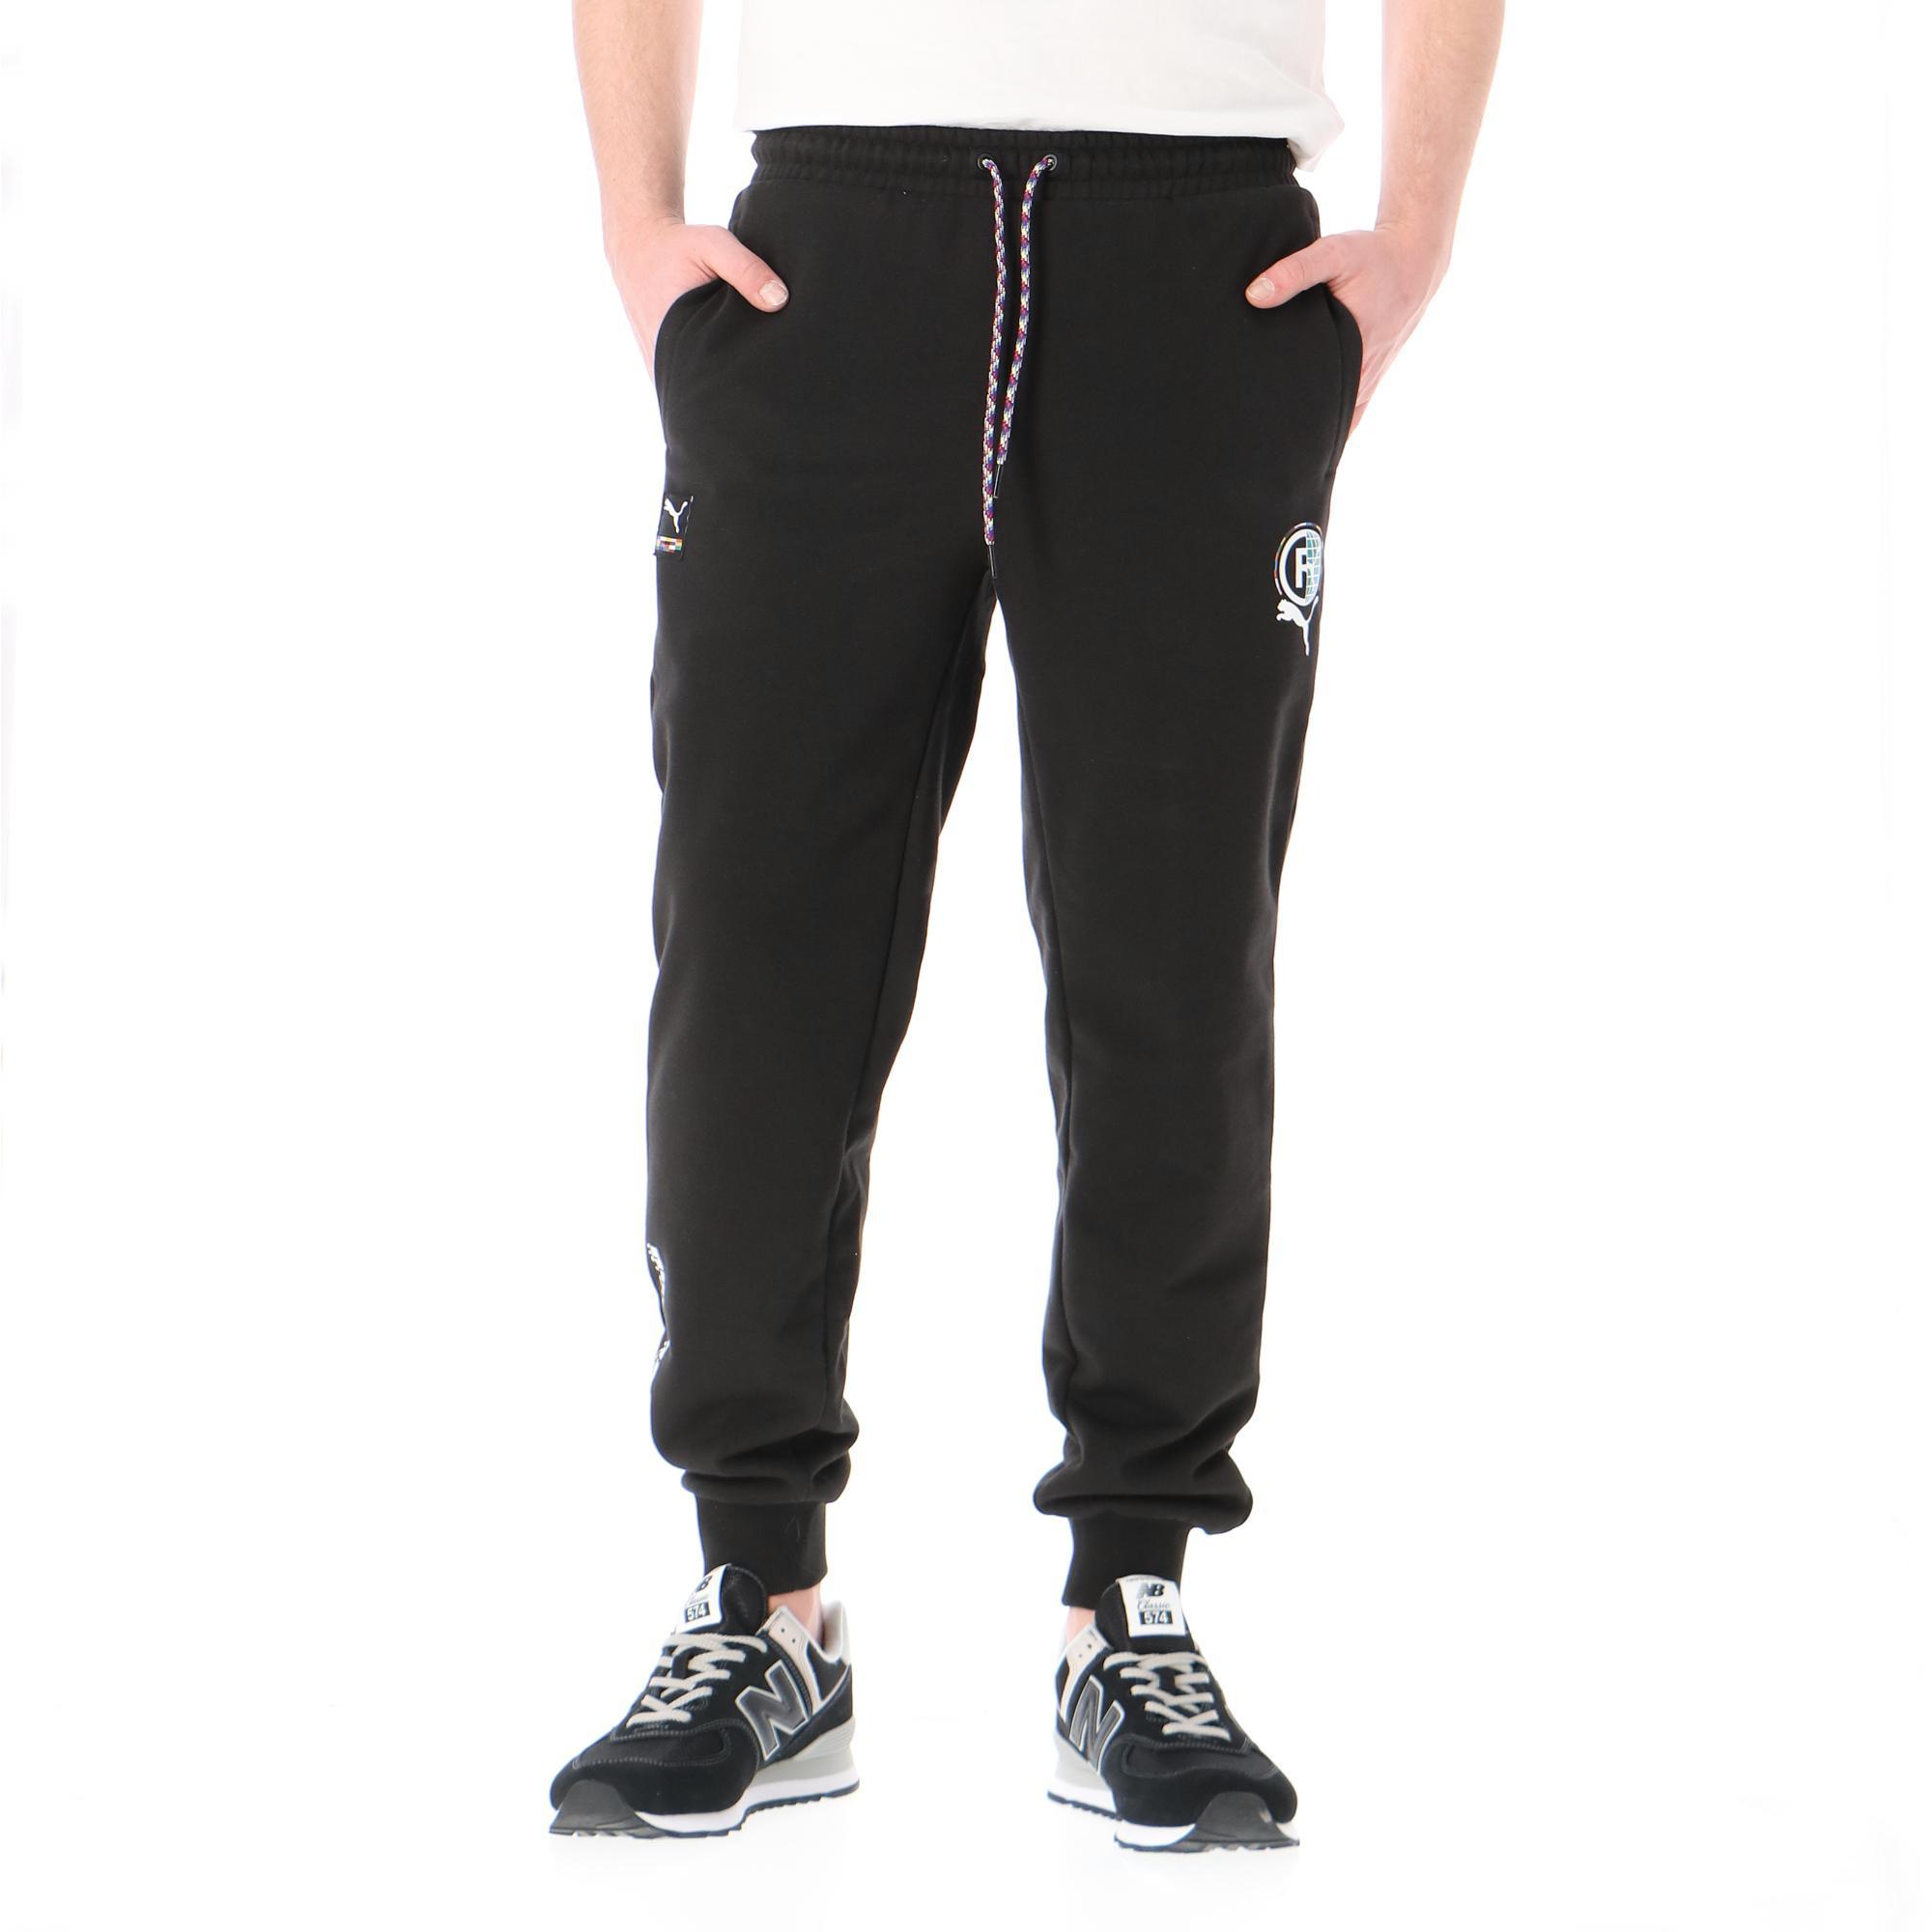 Puma Intl Graphic Pants Black